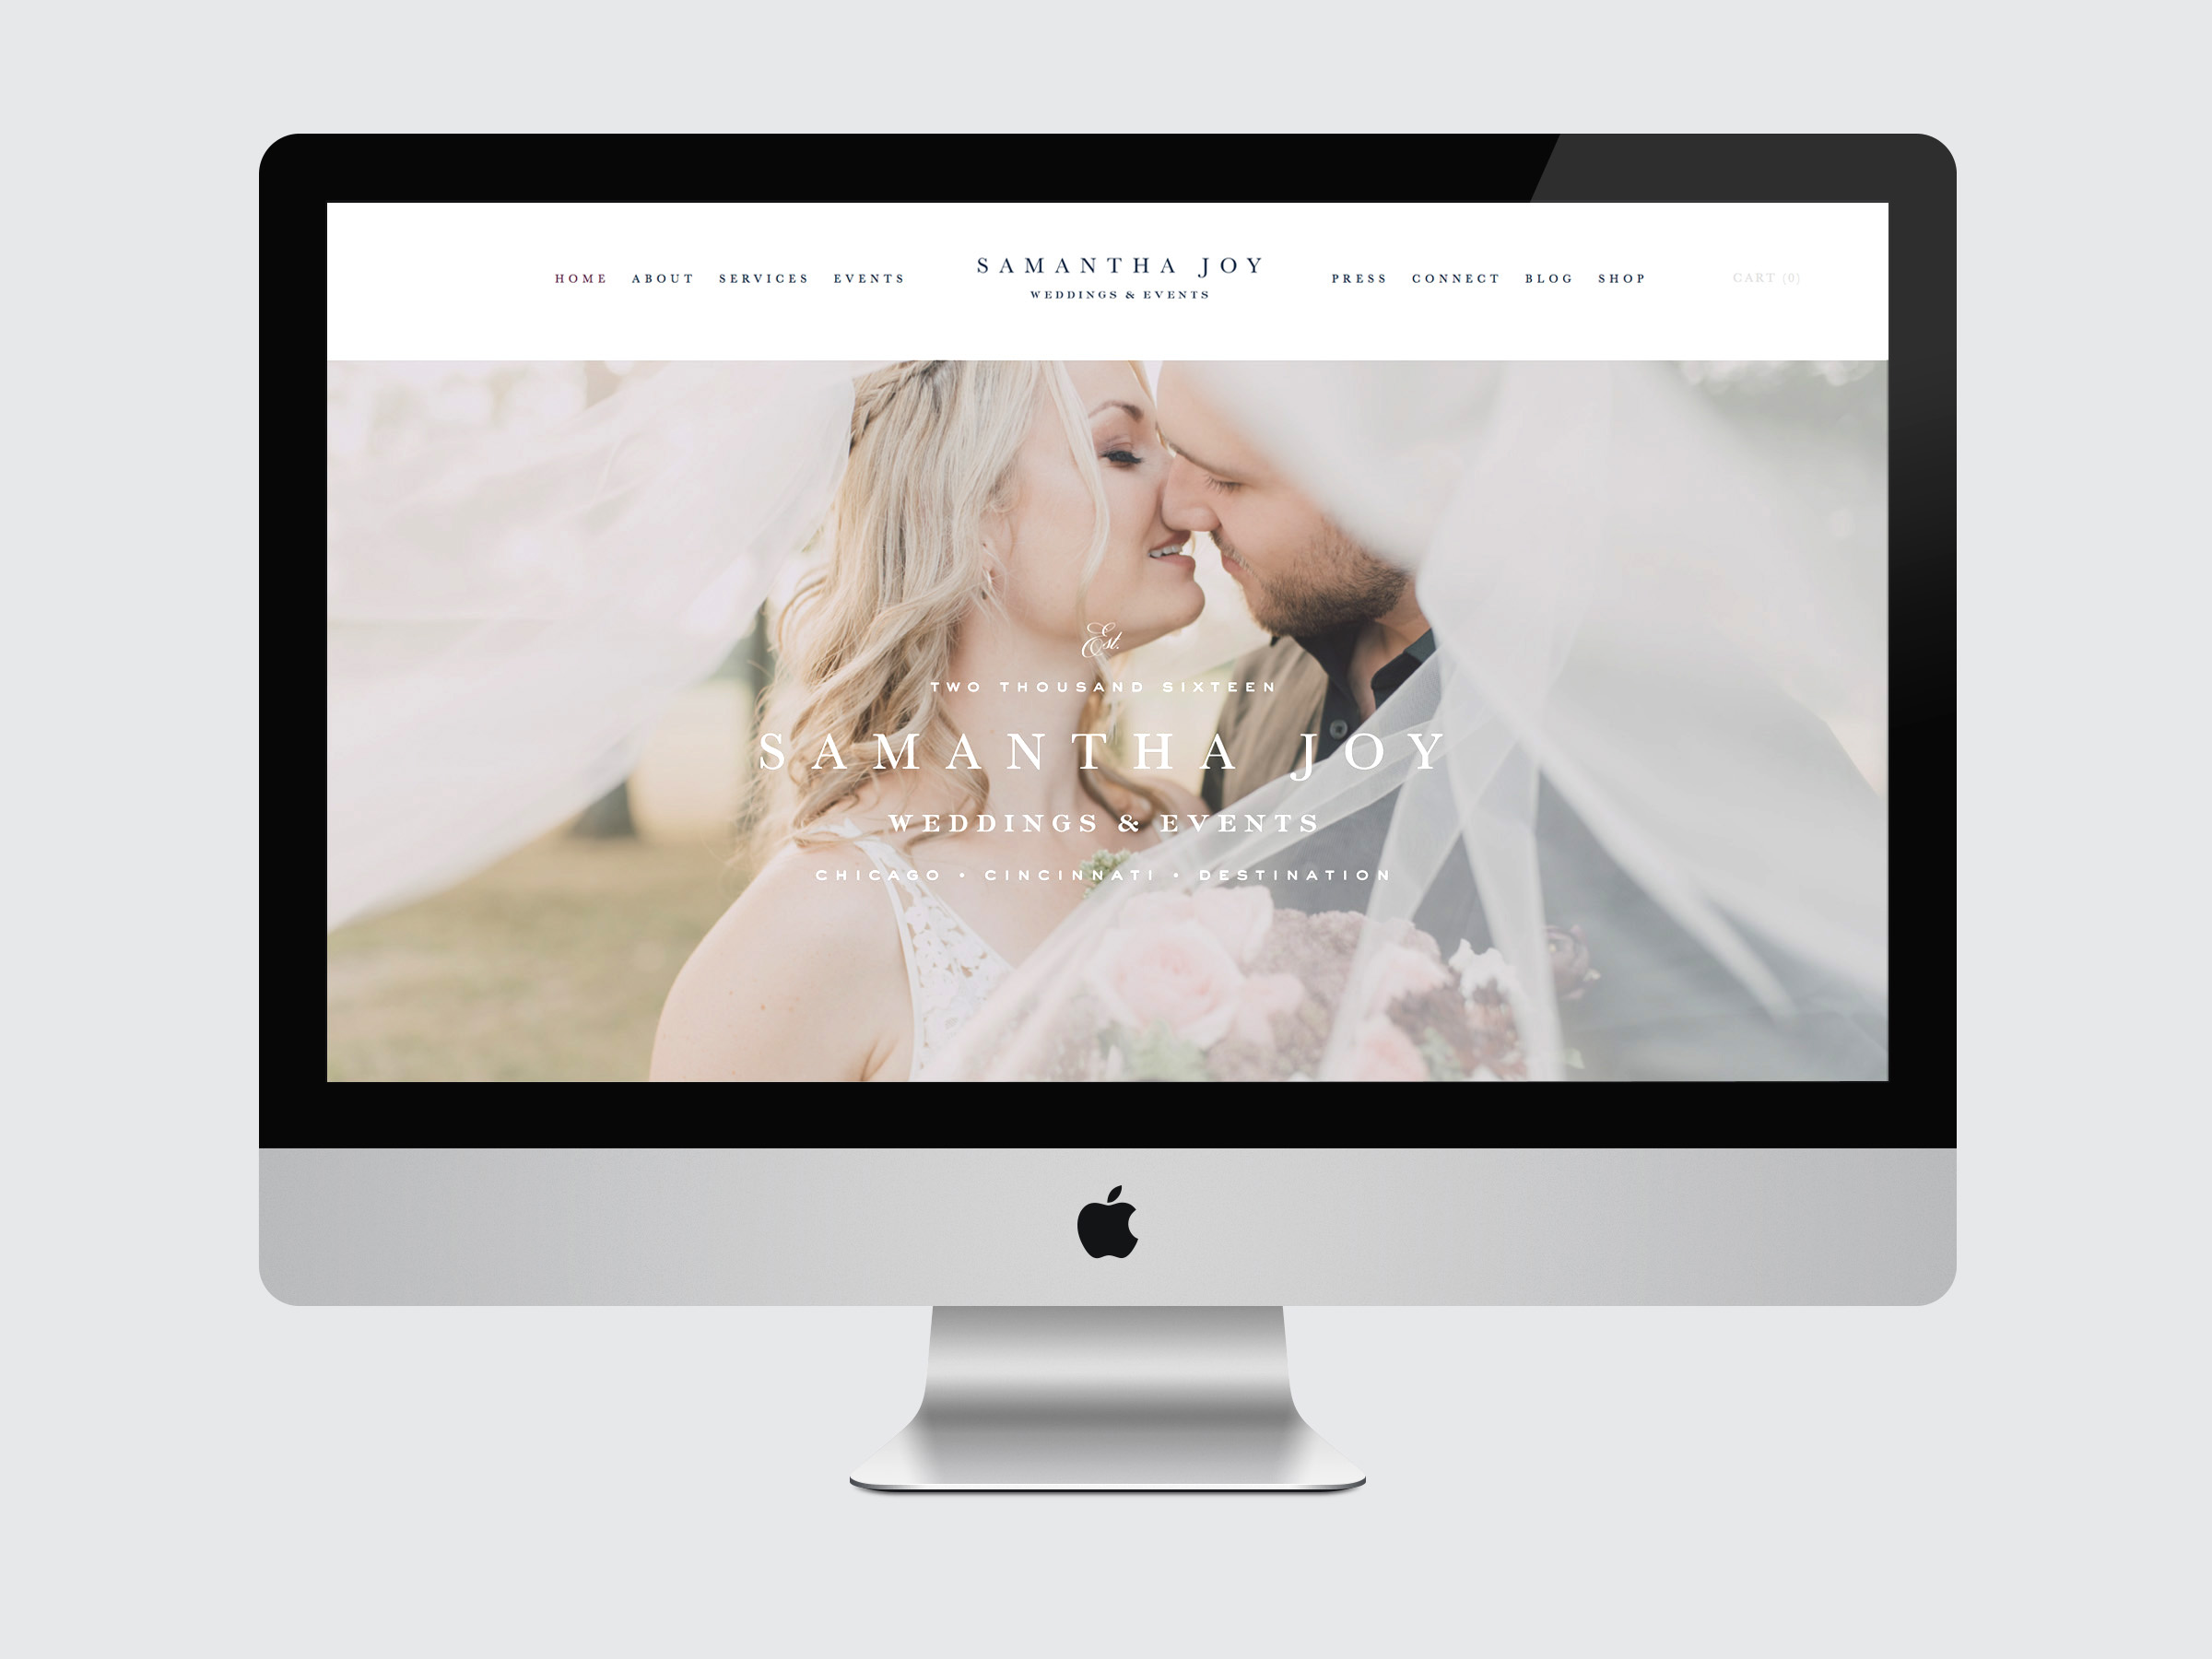 Samantha-Joy-Website-Design.jpg